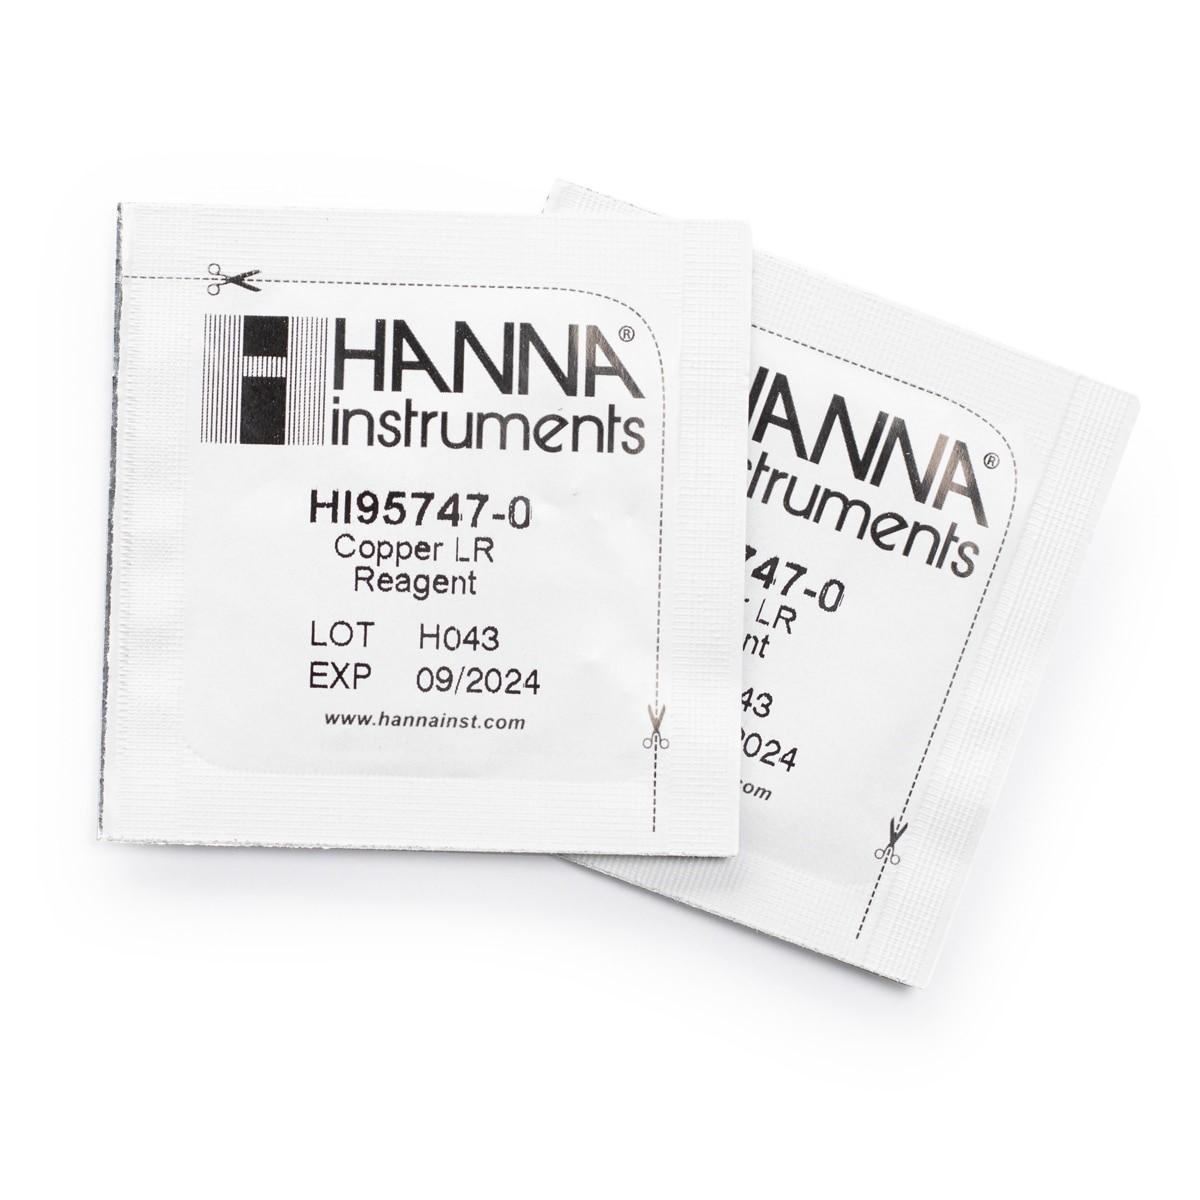 HI95747-01 Copper Low Range Reagents (300 tests)